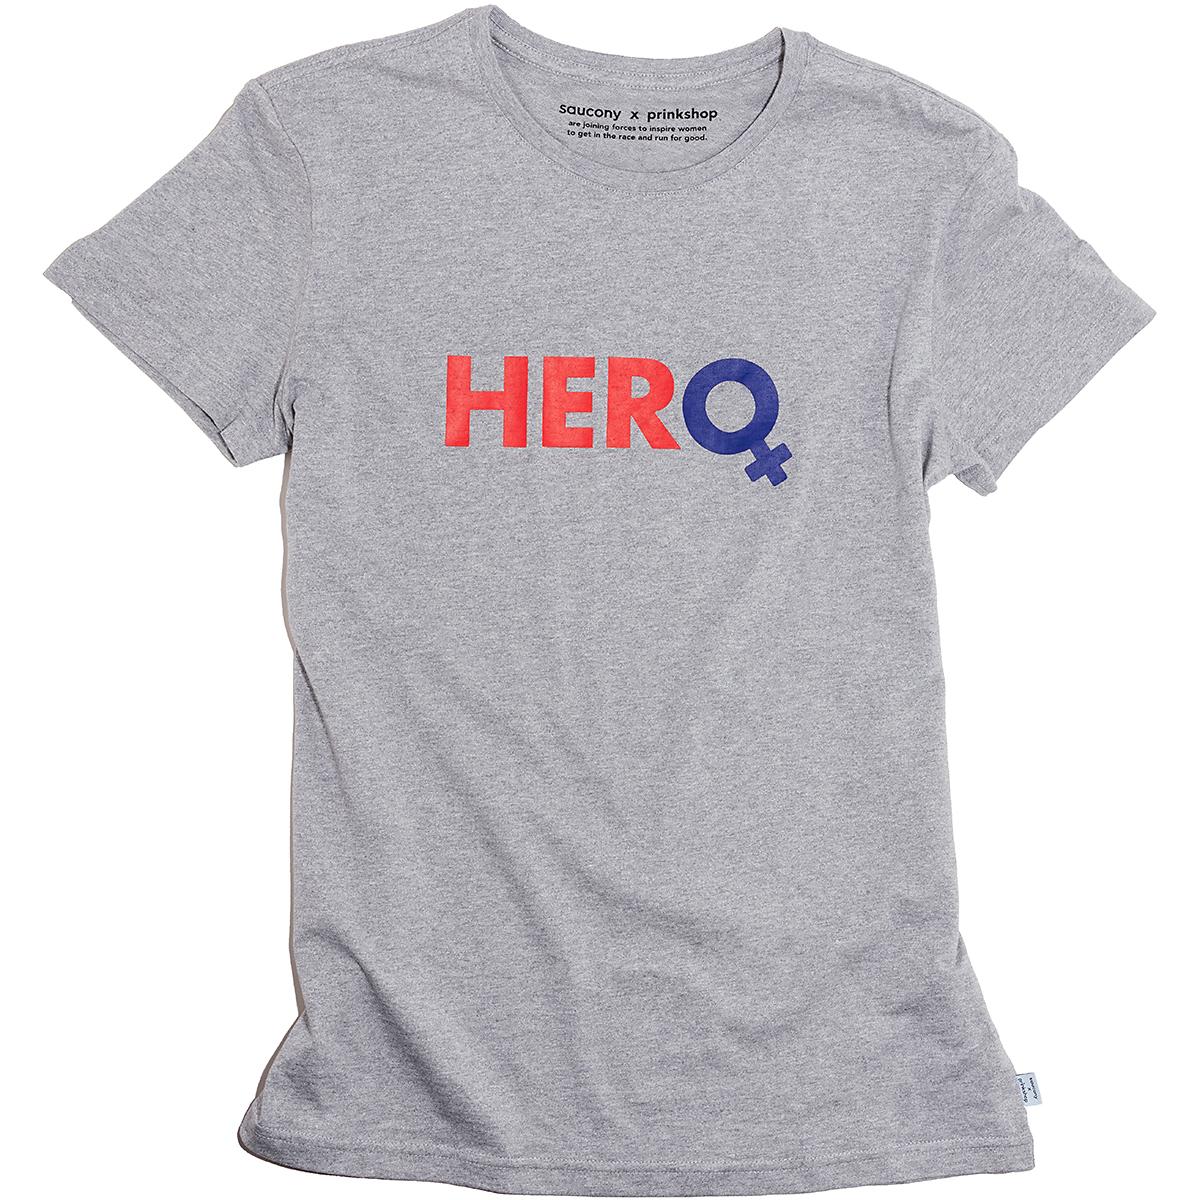 Men's Saucony x Prinkshop Hero T-Shirt  - Color: Light Grey Heather - Size: S, Light Grey Heather, large, image 1